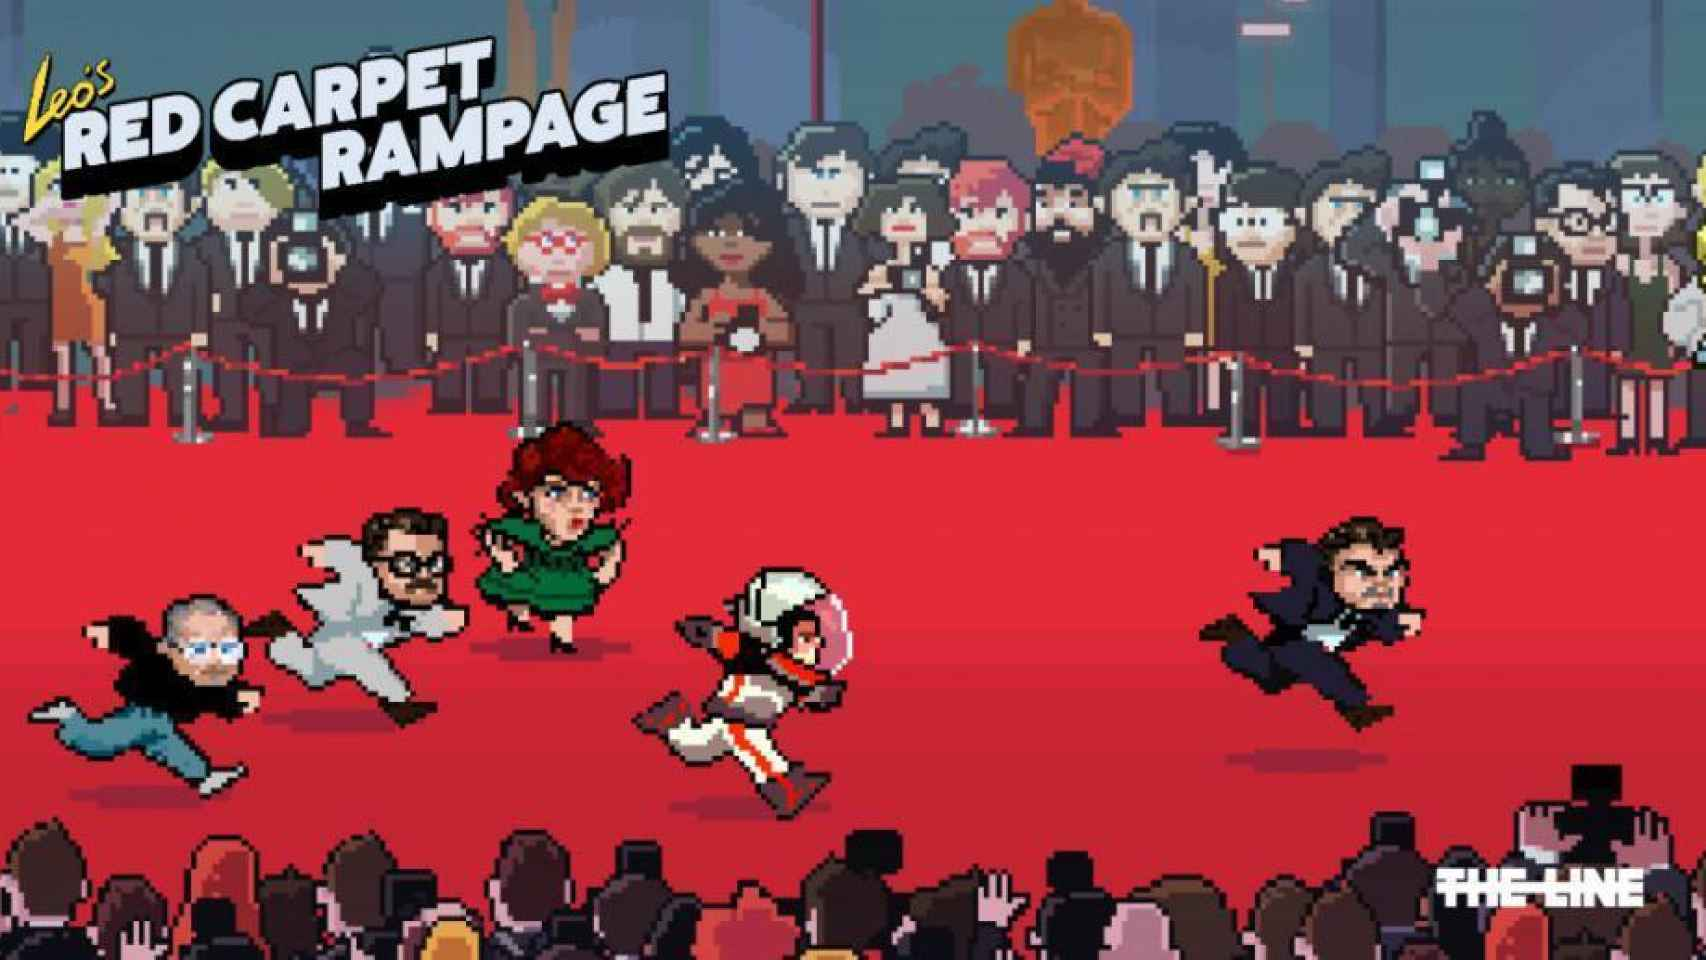 El videojuego Leo's Red Carpet Rampage